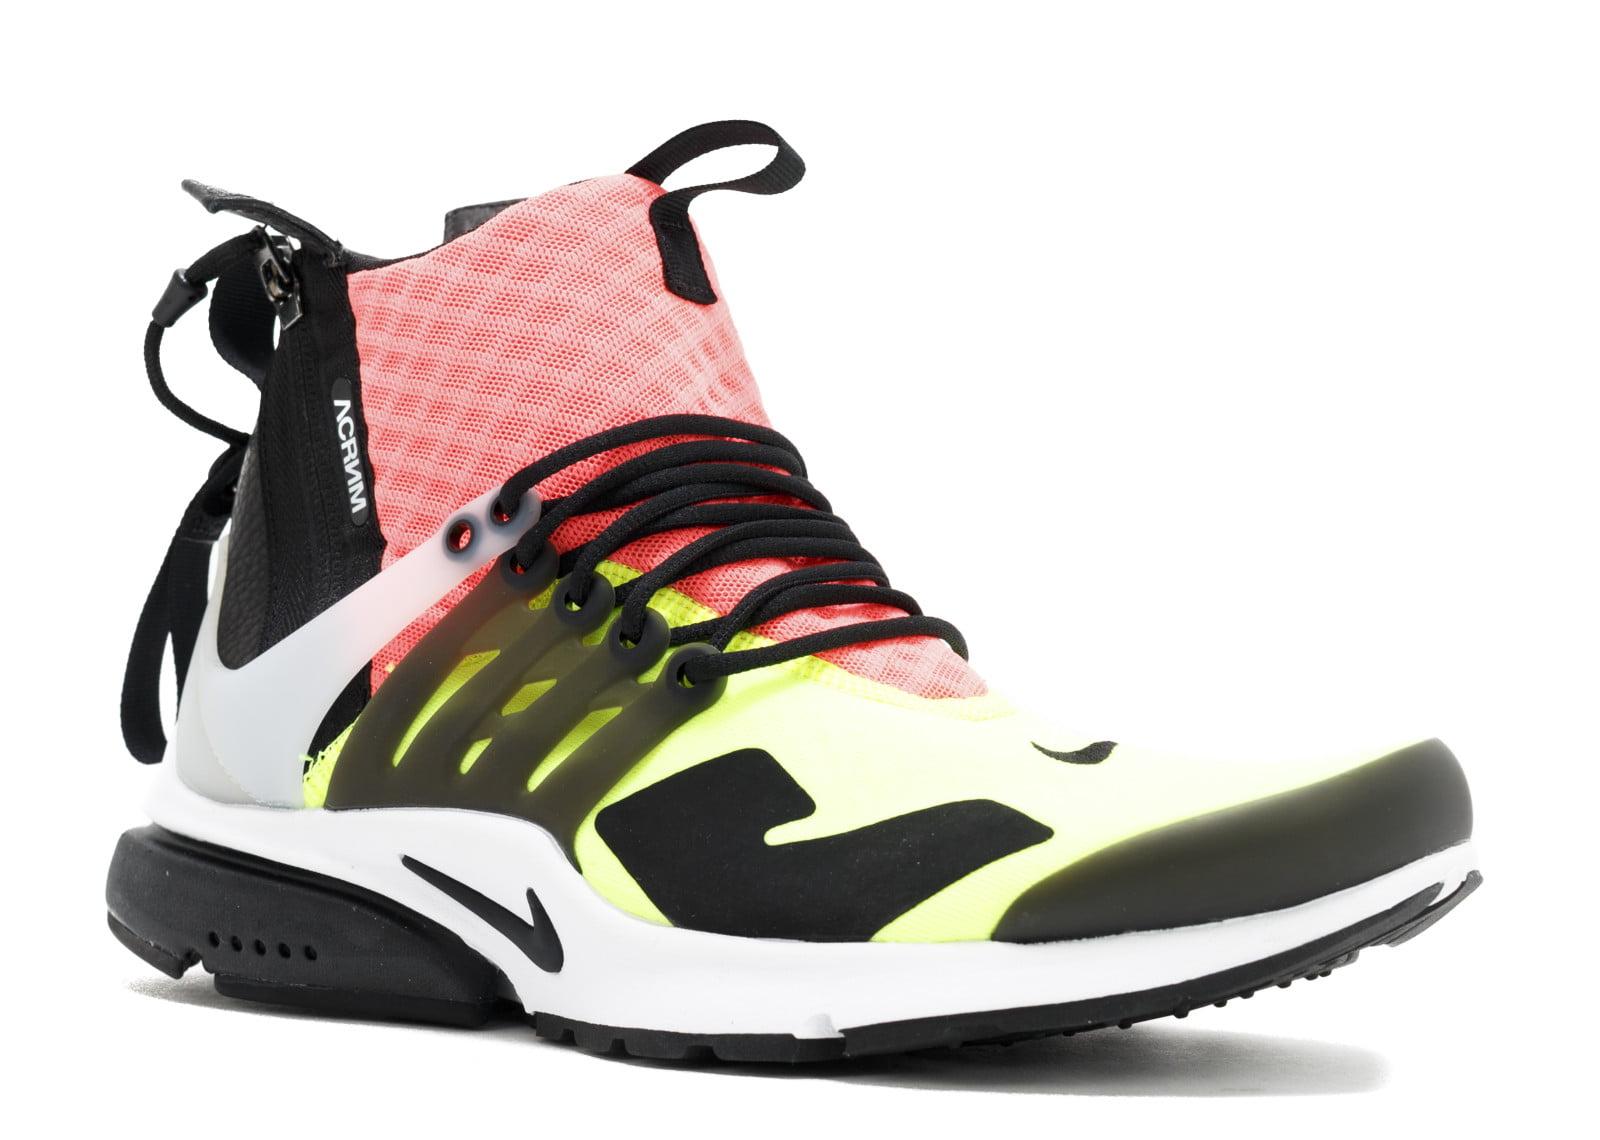 Nike - Men - Air Presto Mid / Acronym